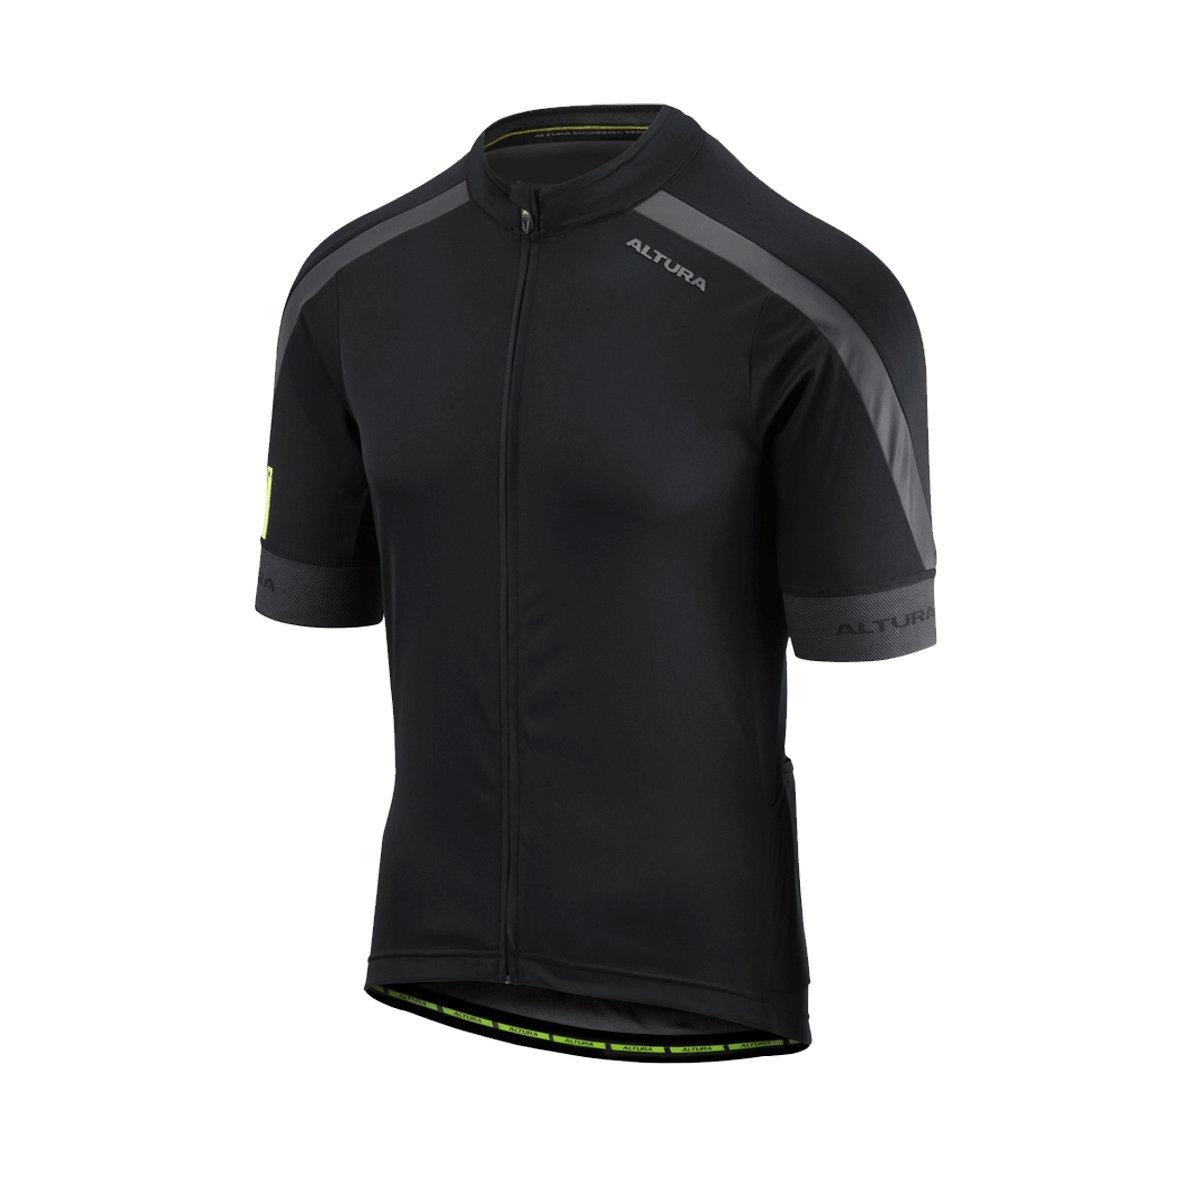 Altura Men s NV2 Short Sleeve Jersey  Altura  Amazon.co.uk  Sports    Outdoors 7695d6ffc